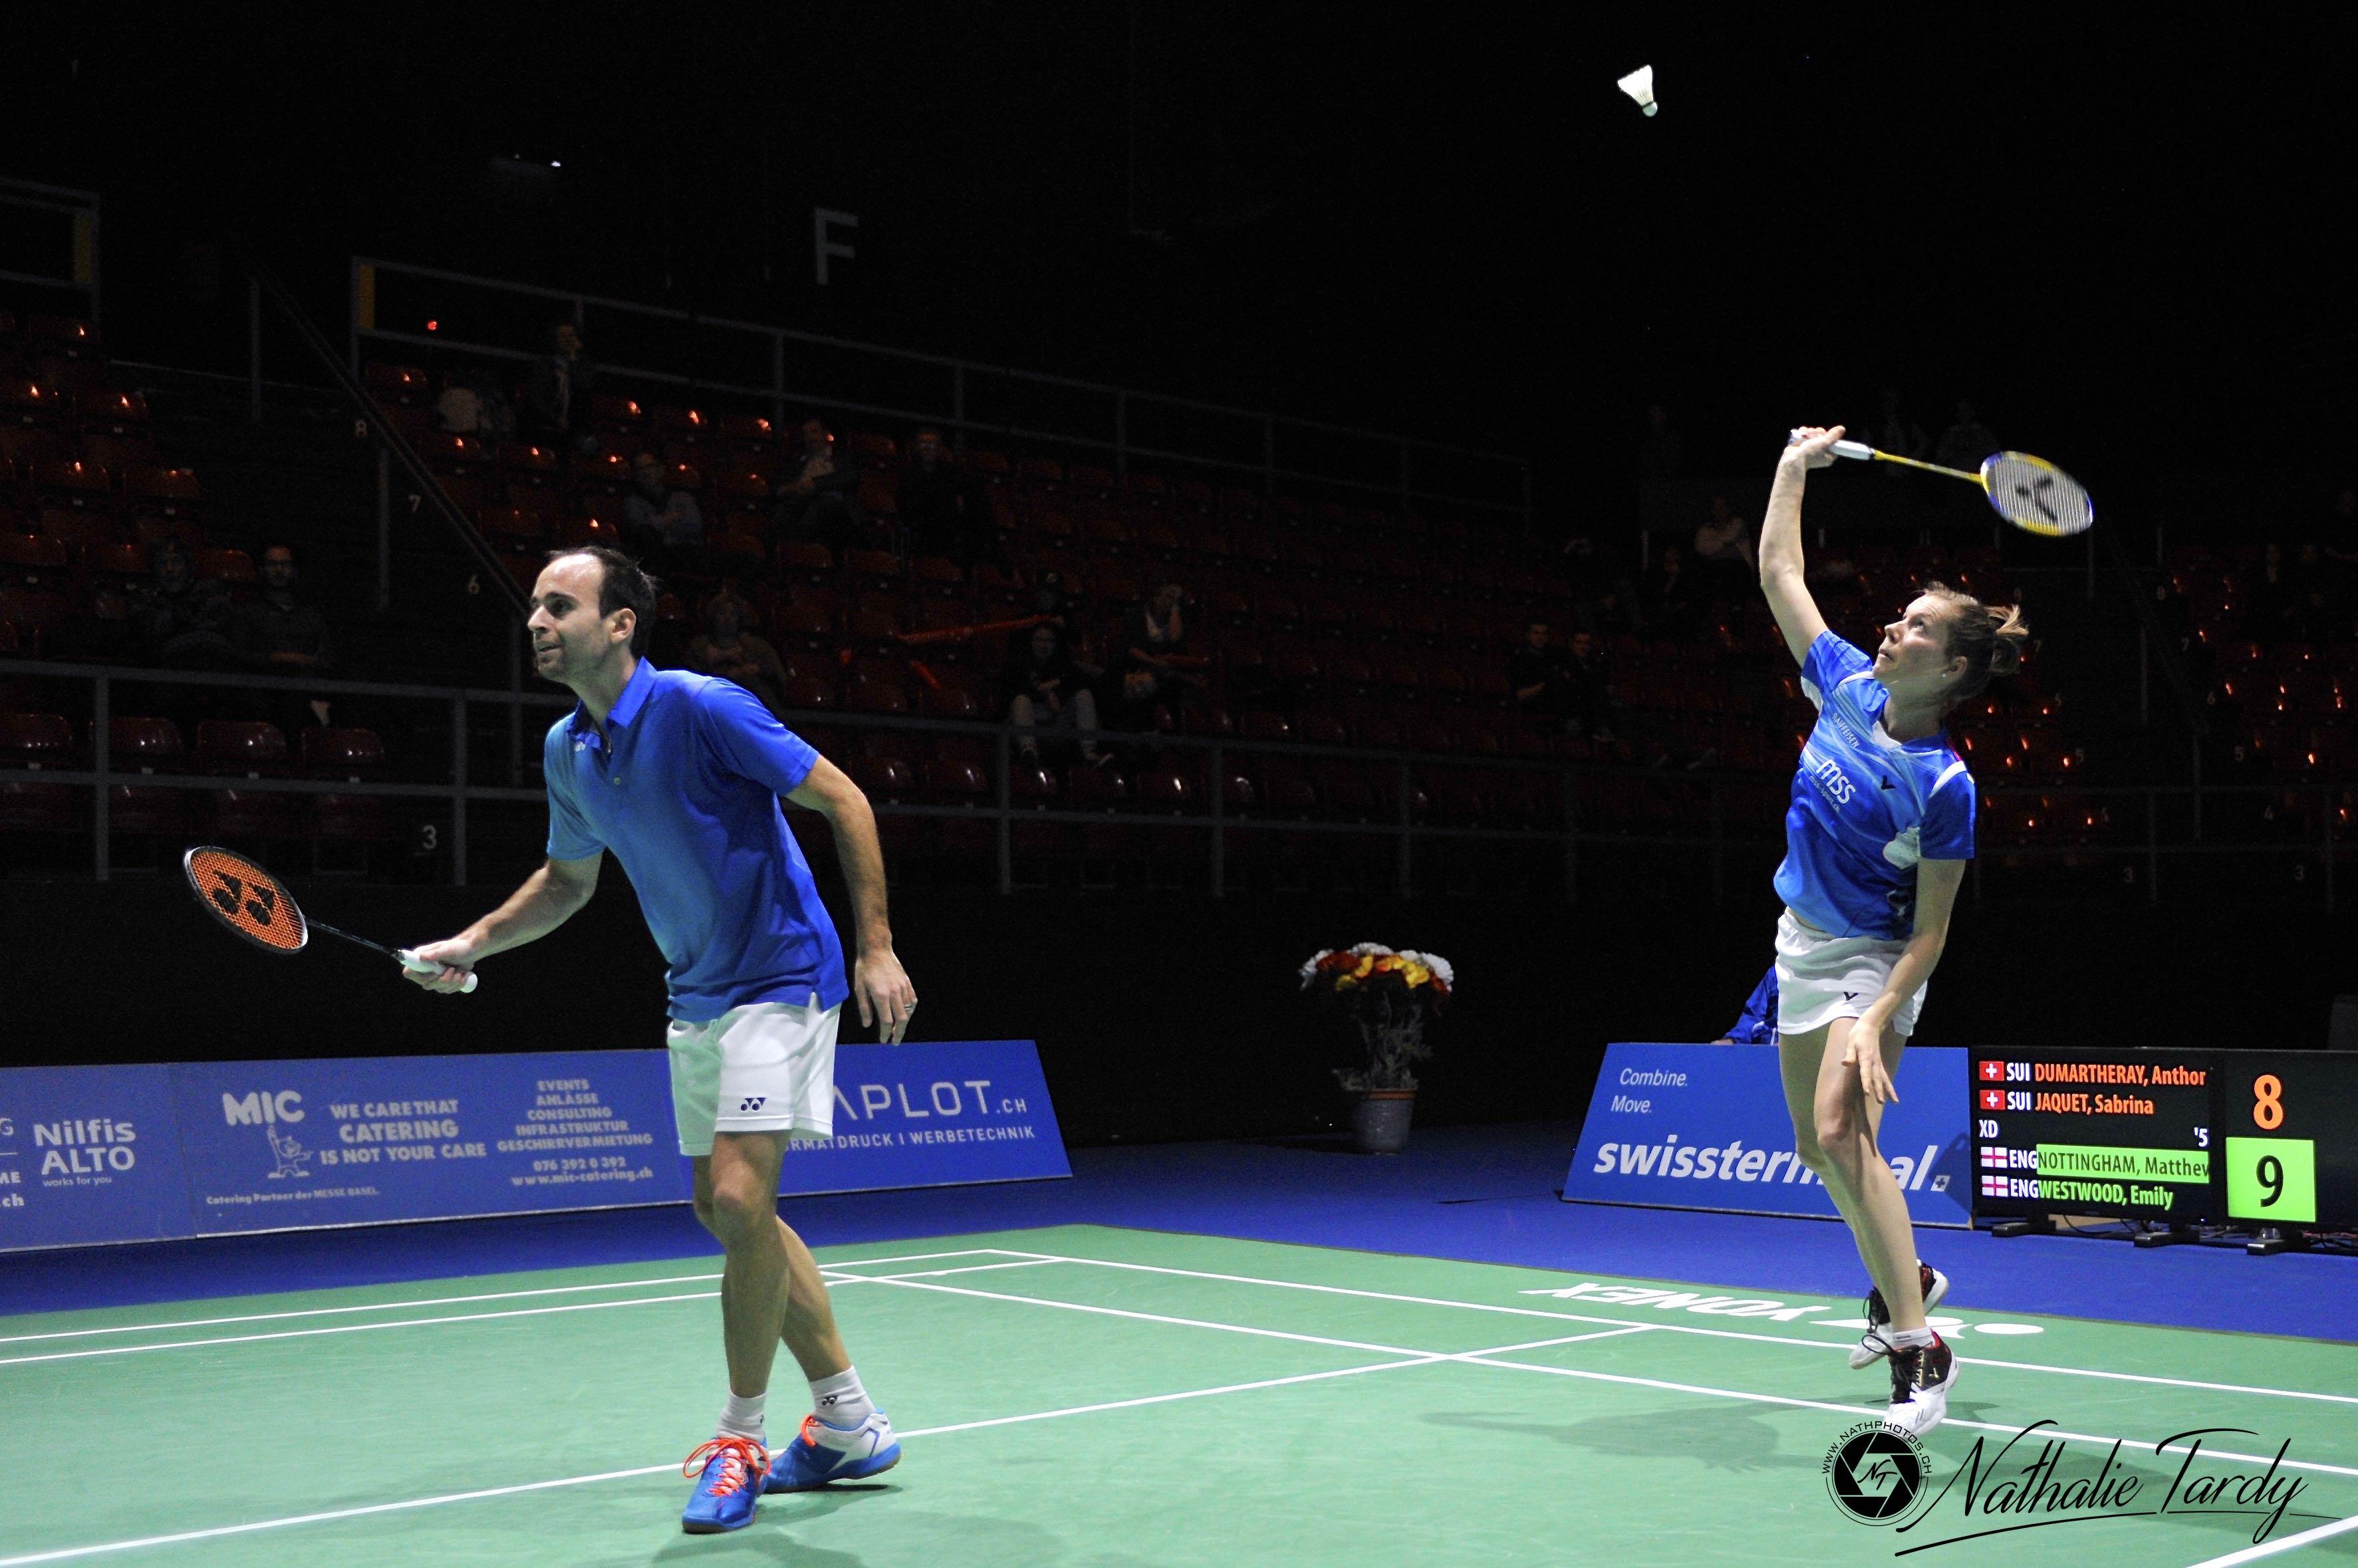 Nathalie Tardy, Swiss Open 2016 (double mixte)-2